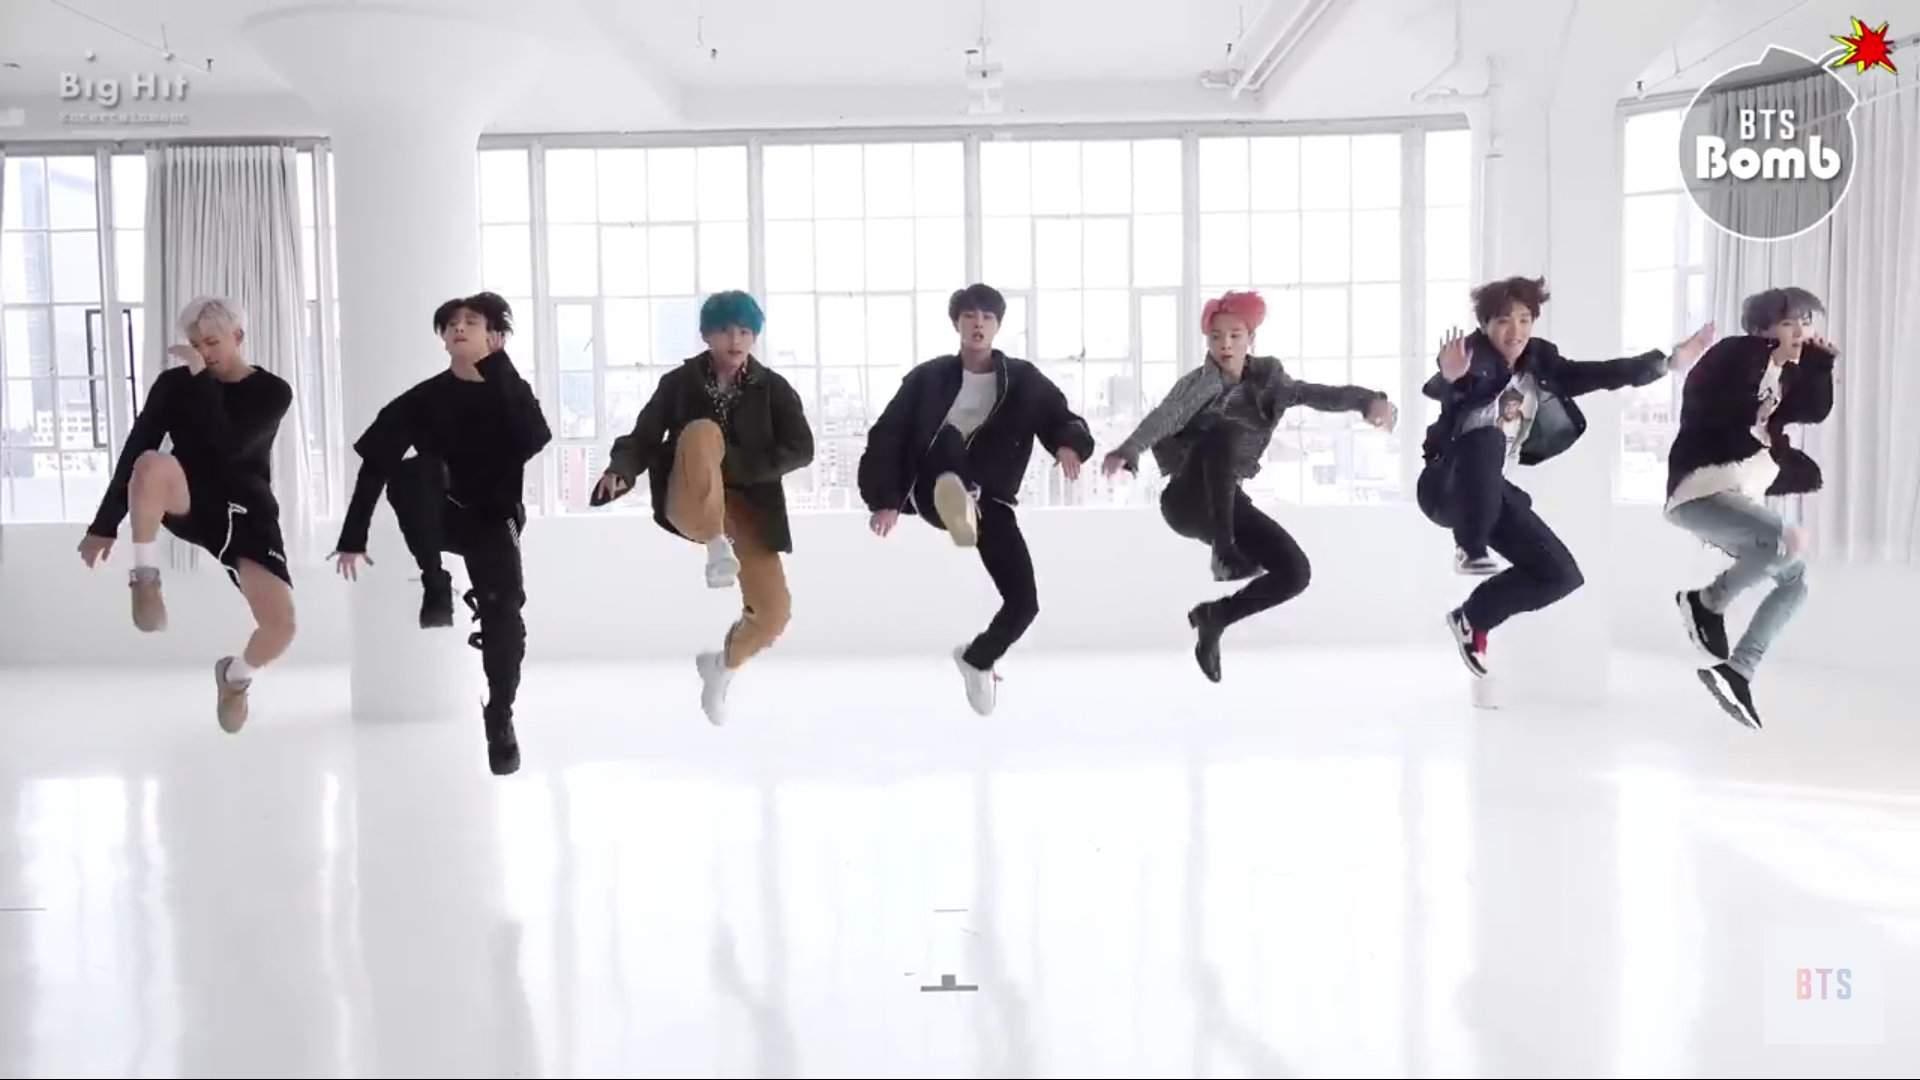 BANGTAN BOMB] '작은 것들을 위한 시 (Boy With Luv)' Dance Practice (Eye contact  ver.) - BTS (방탄소년단)   BTS Amino